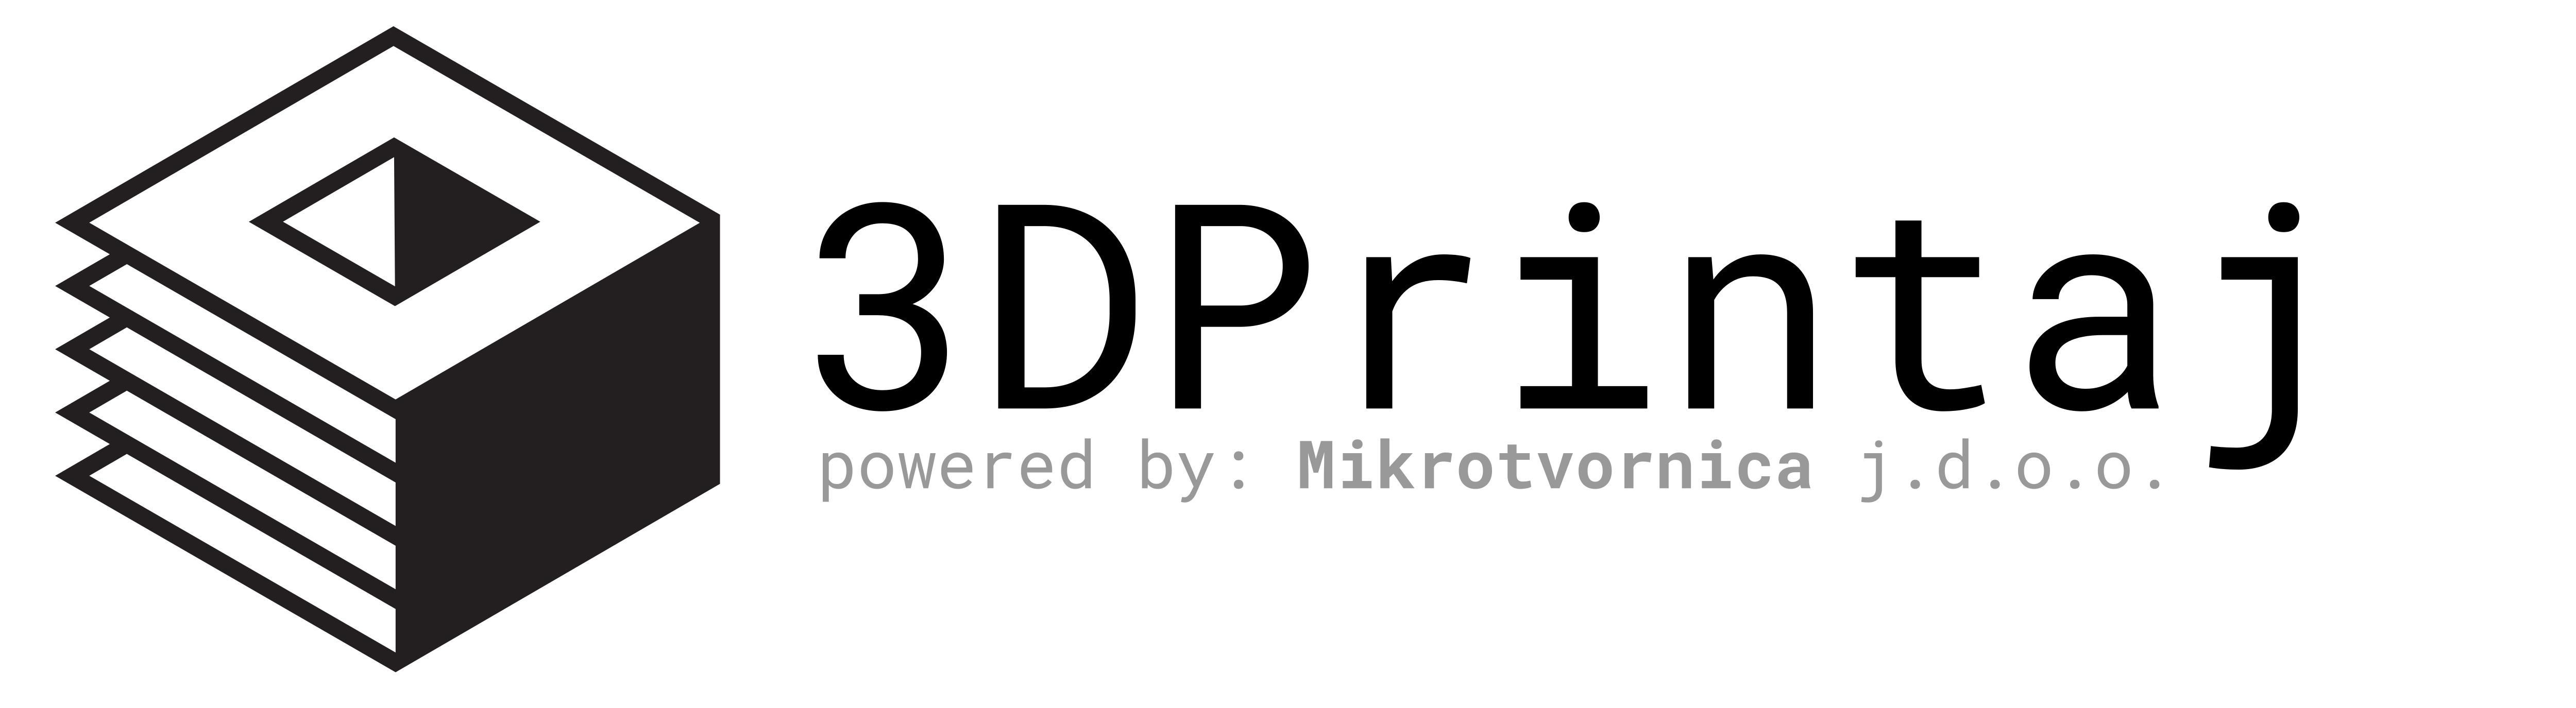 Donation of materials by 3DPrintaj